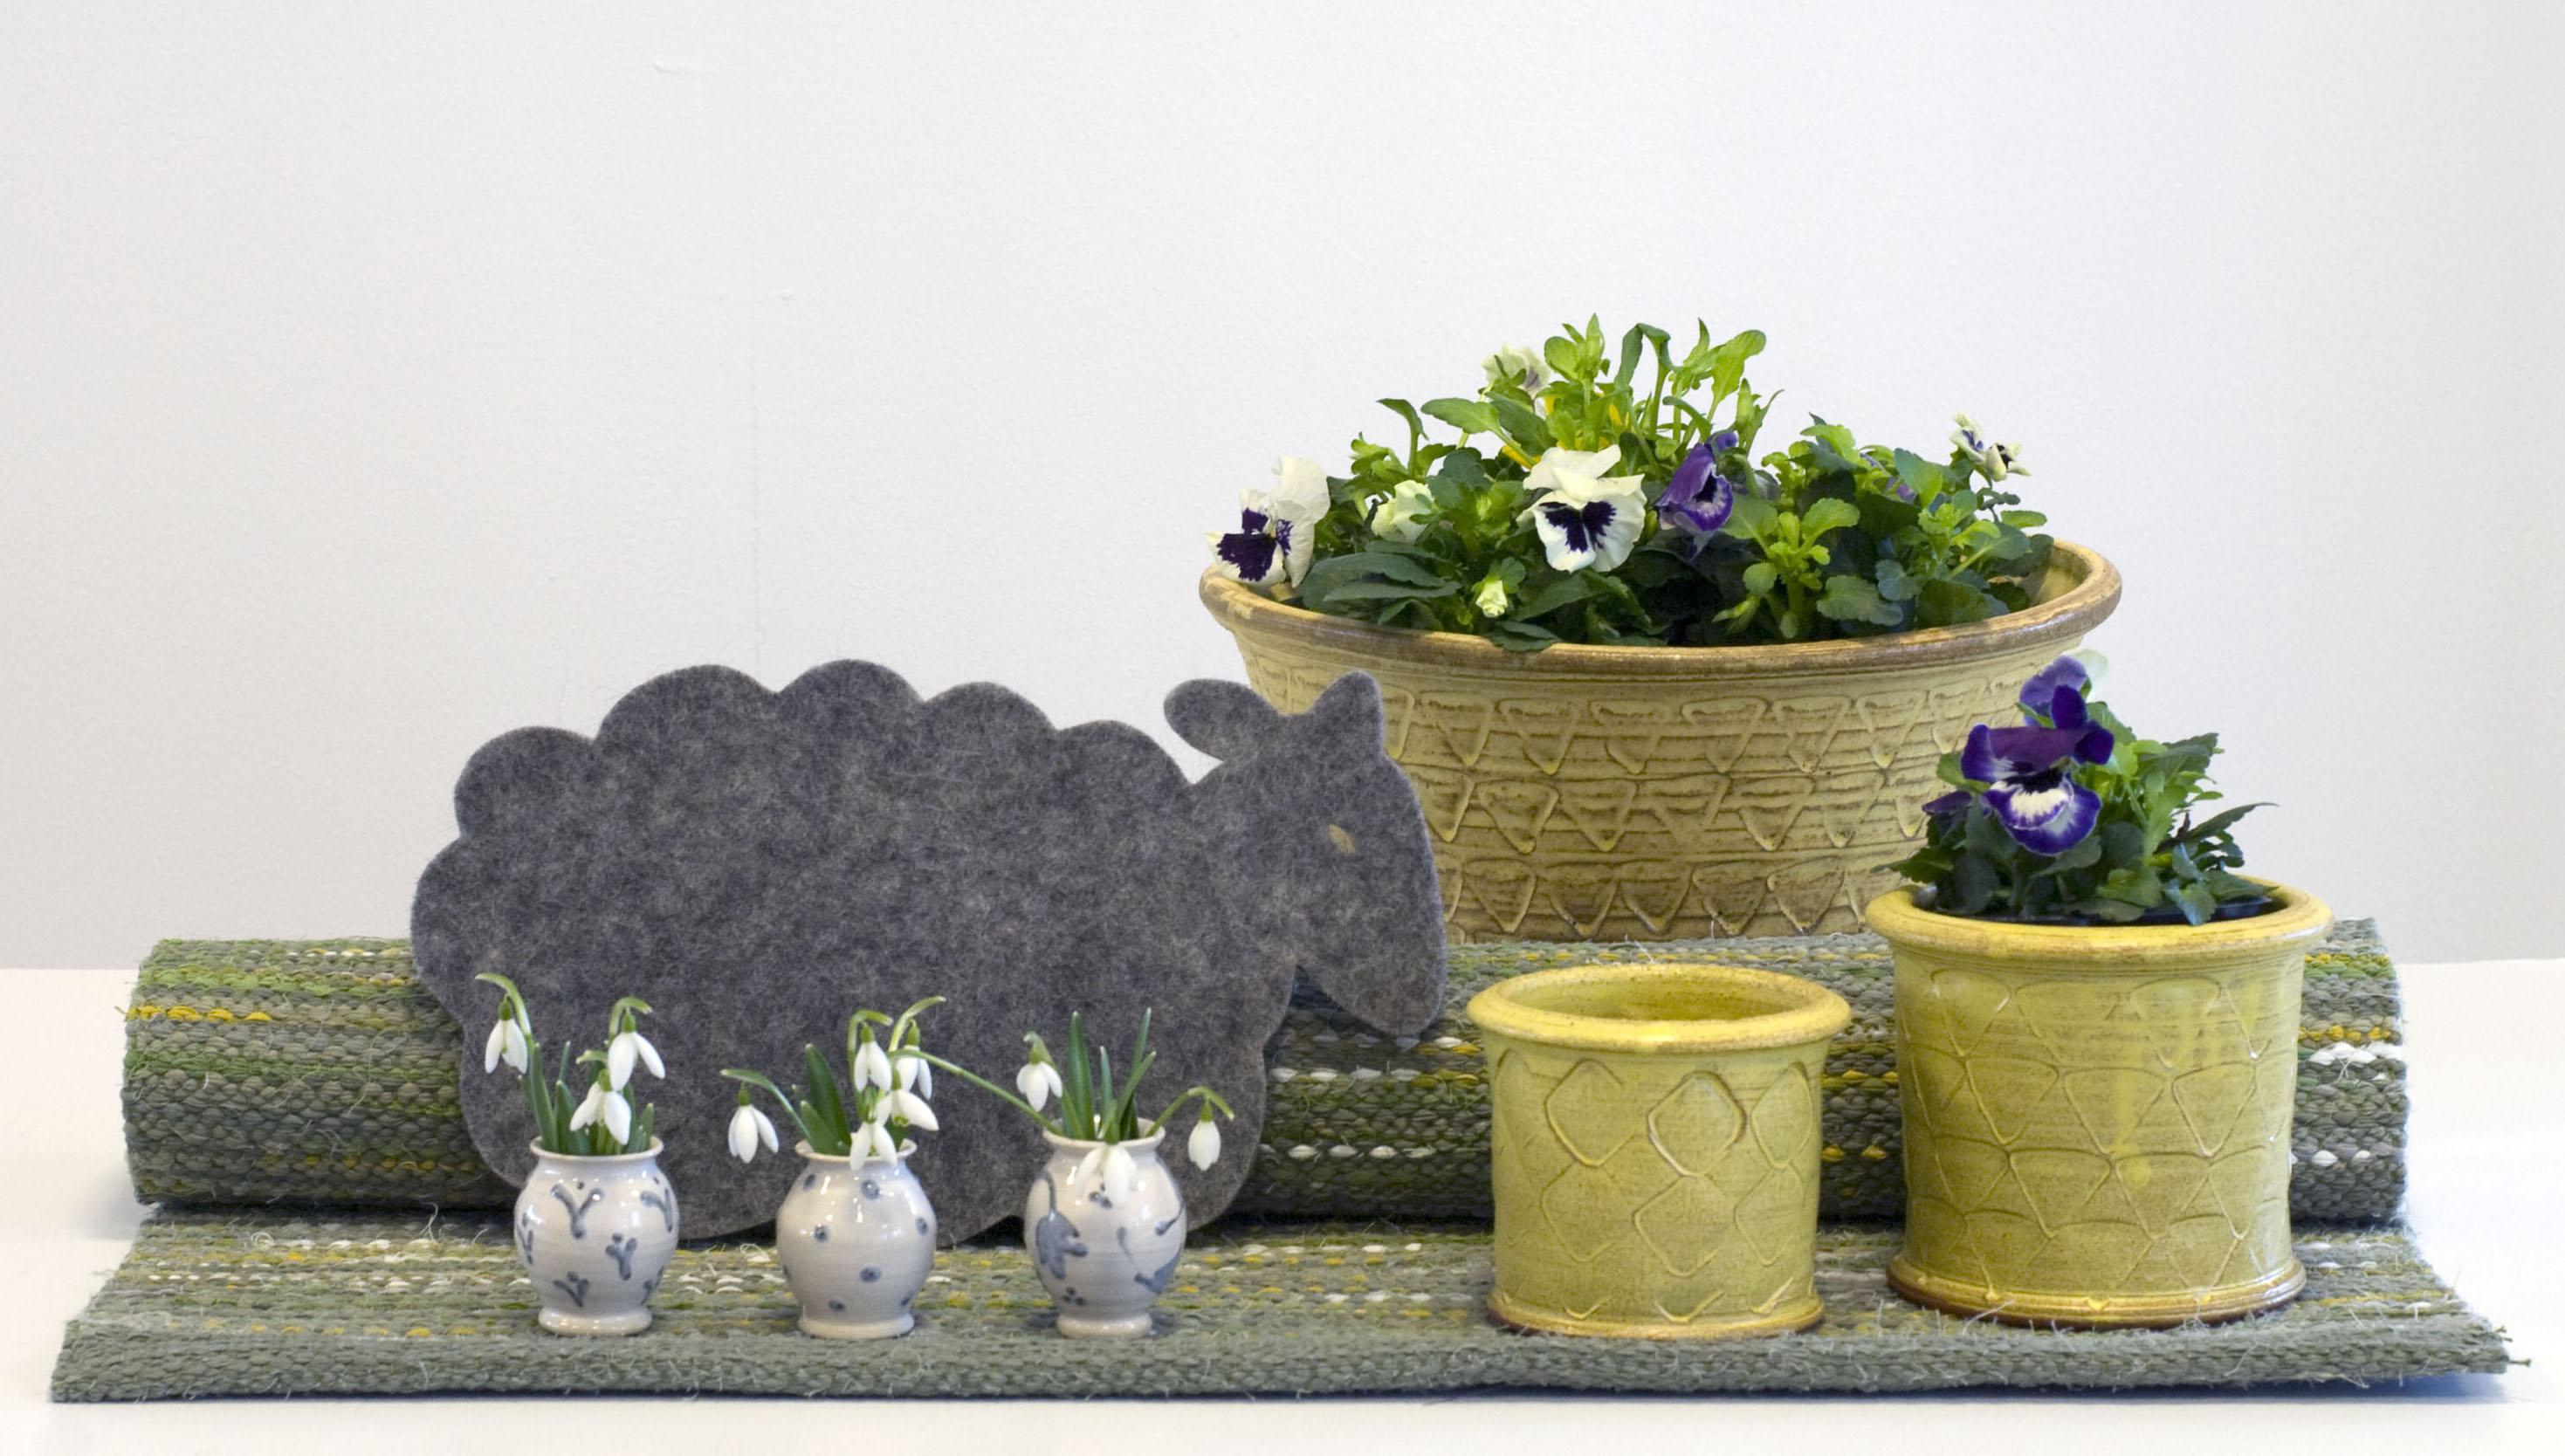 Keramik handdrejad